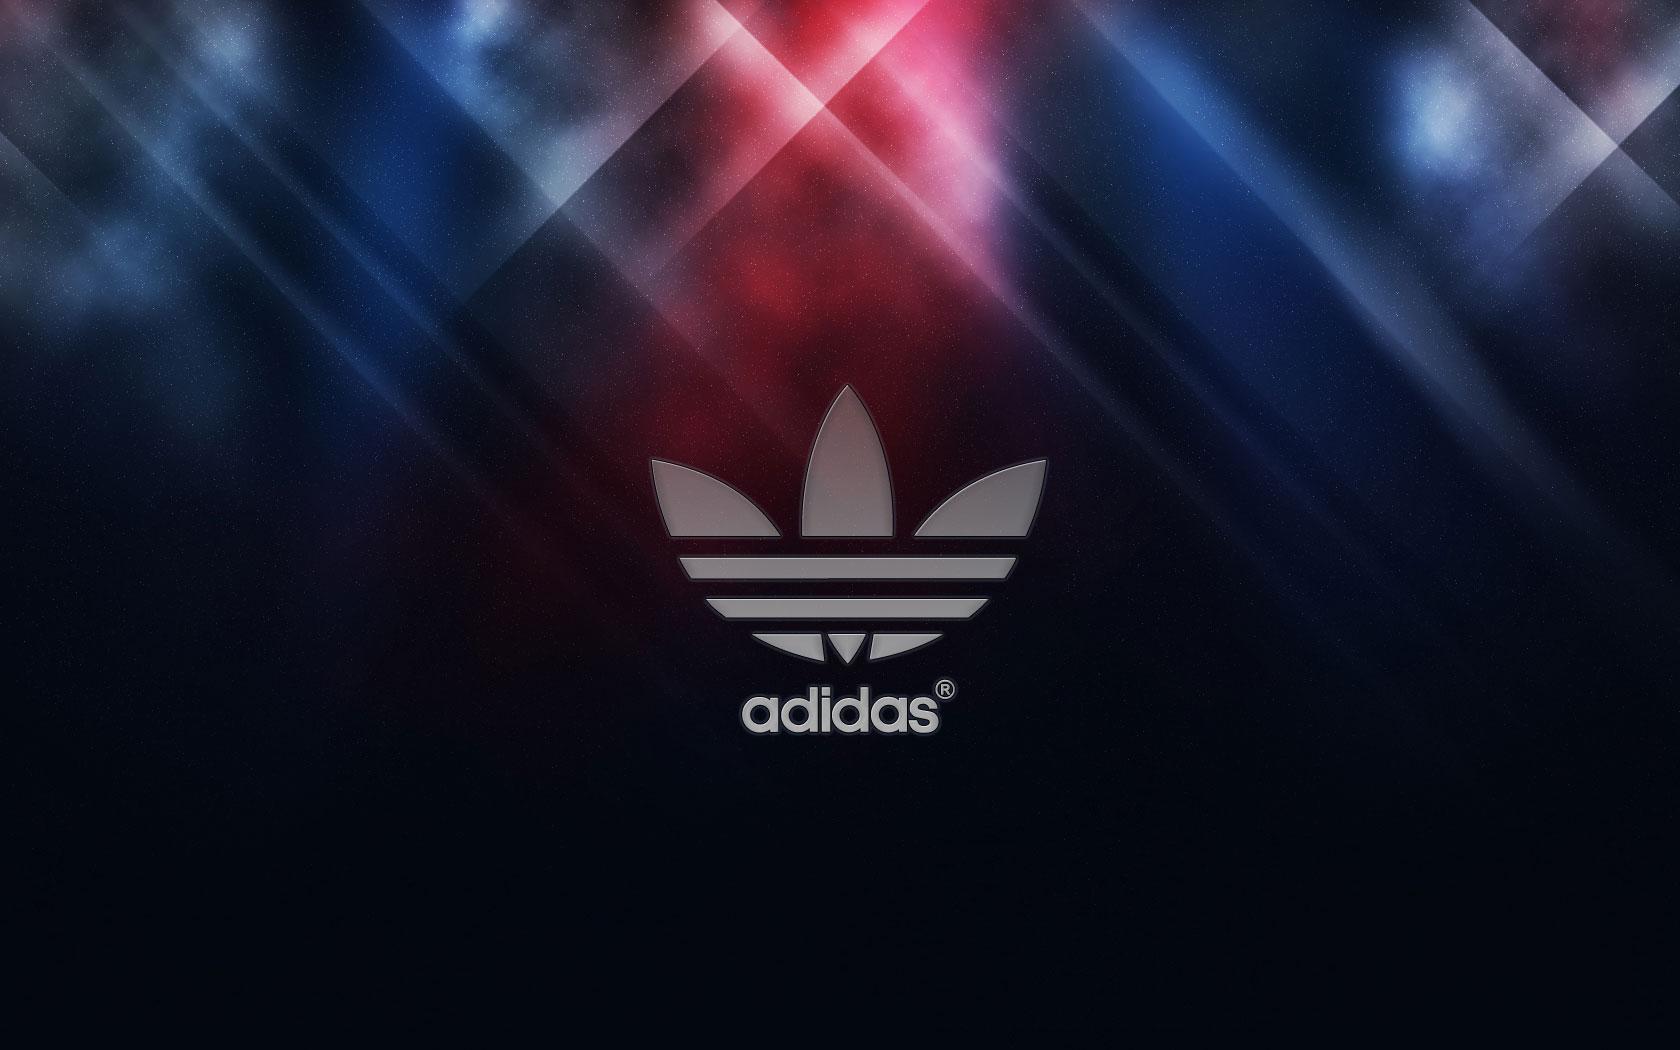 Pics Photos   Awesome Adidas 2013 Hd Wallpaper For Desktop 1680x1050